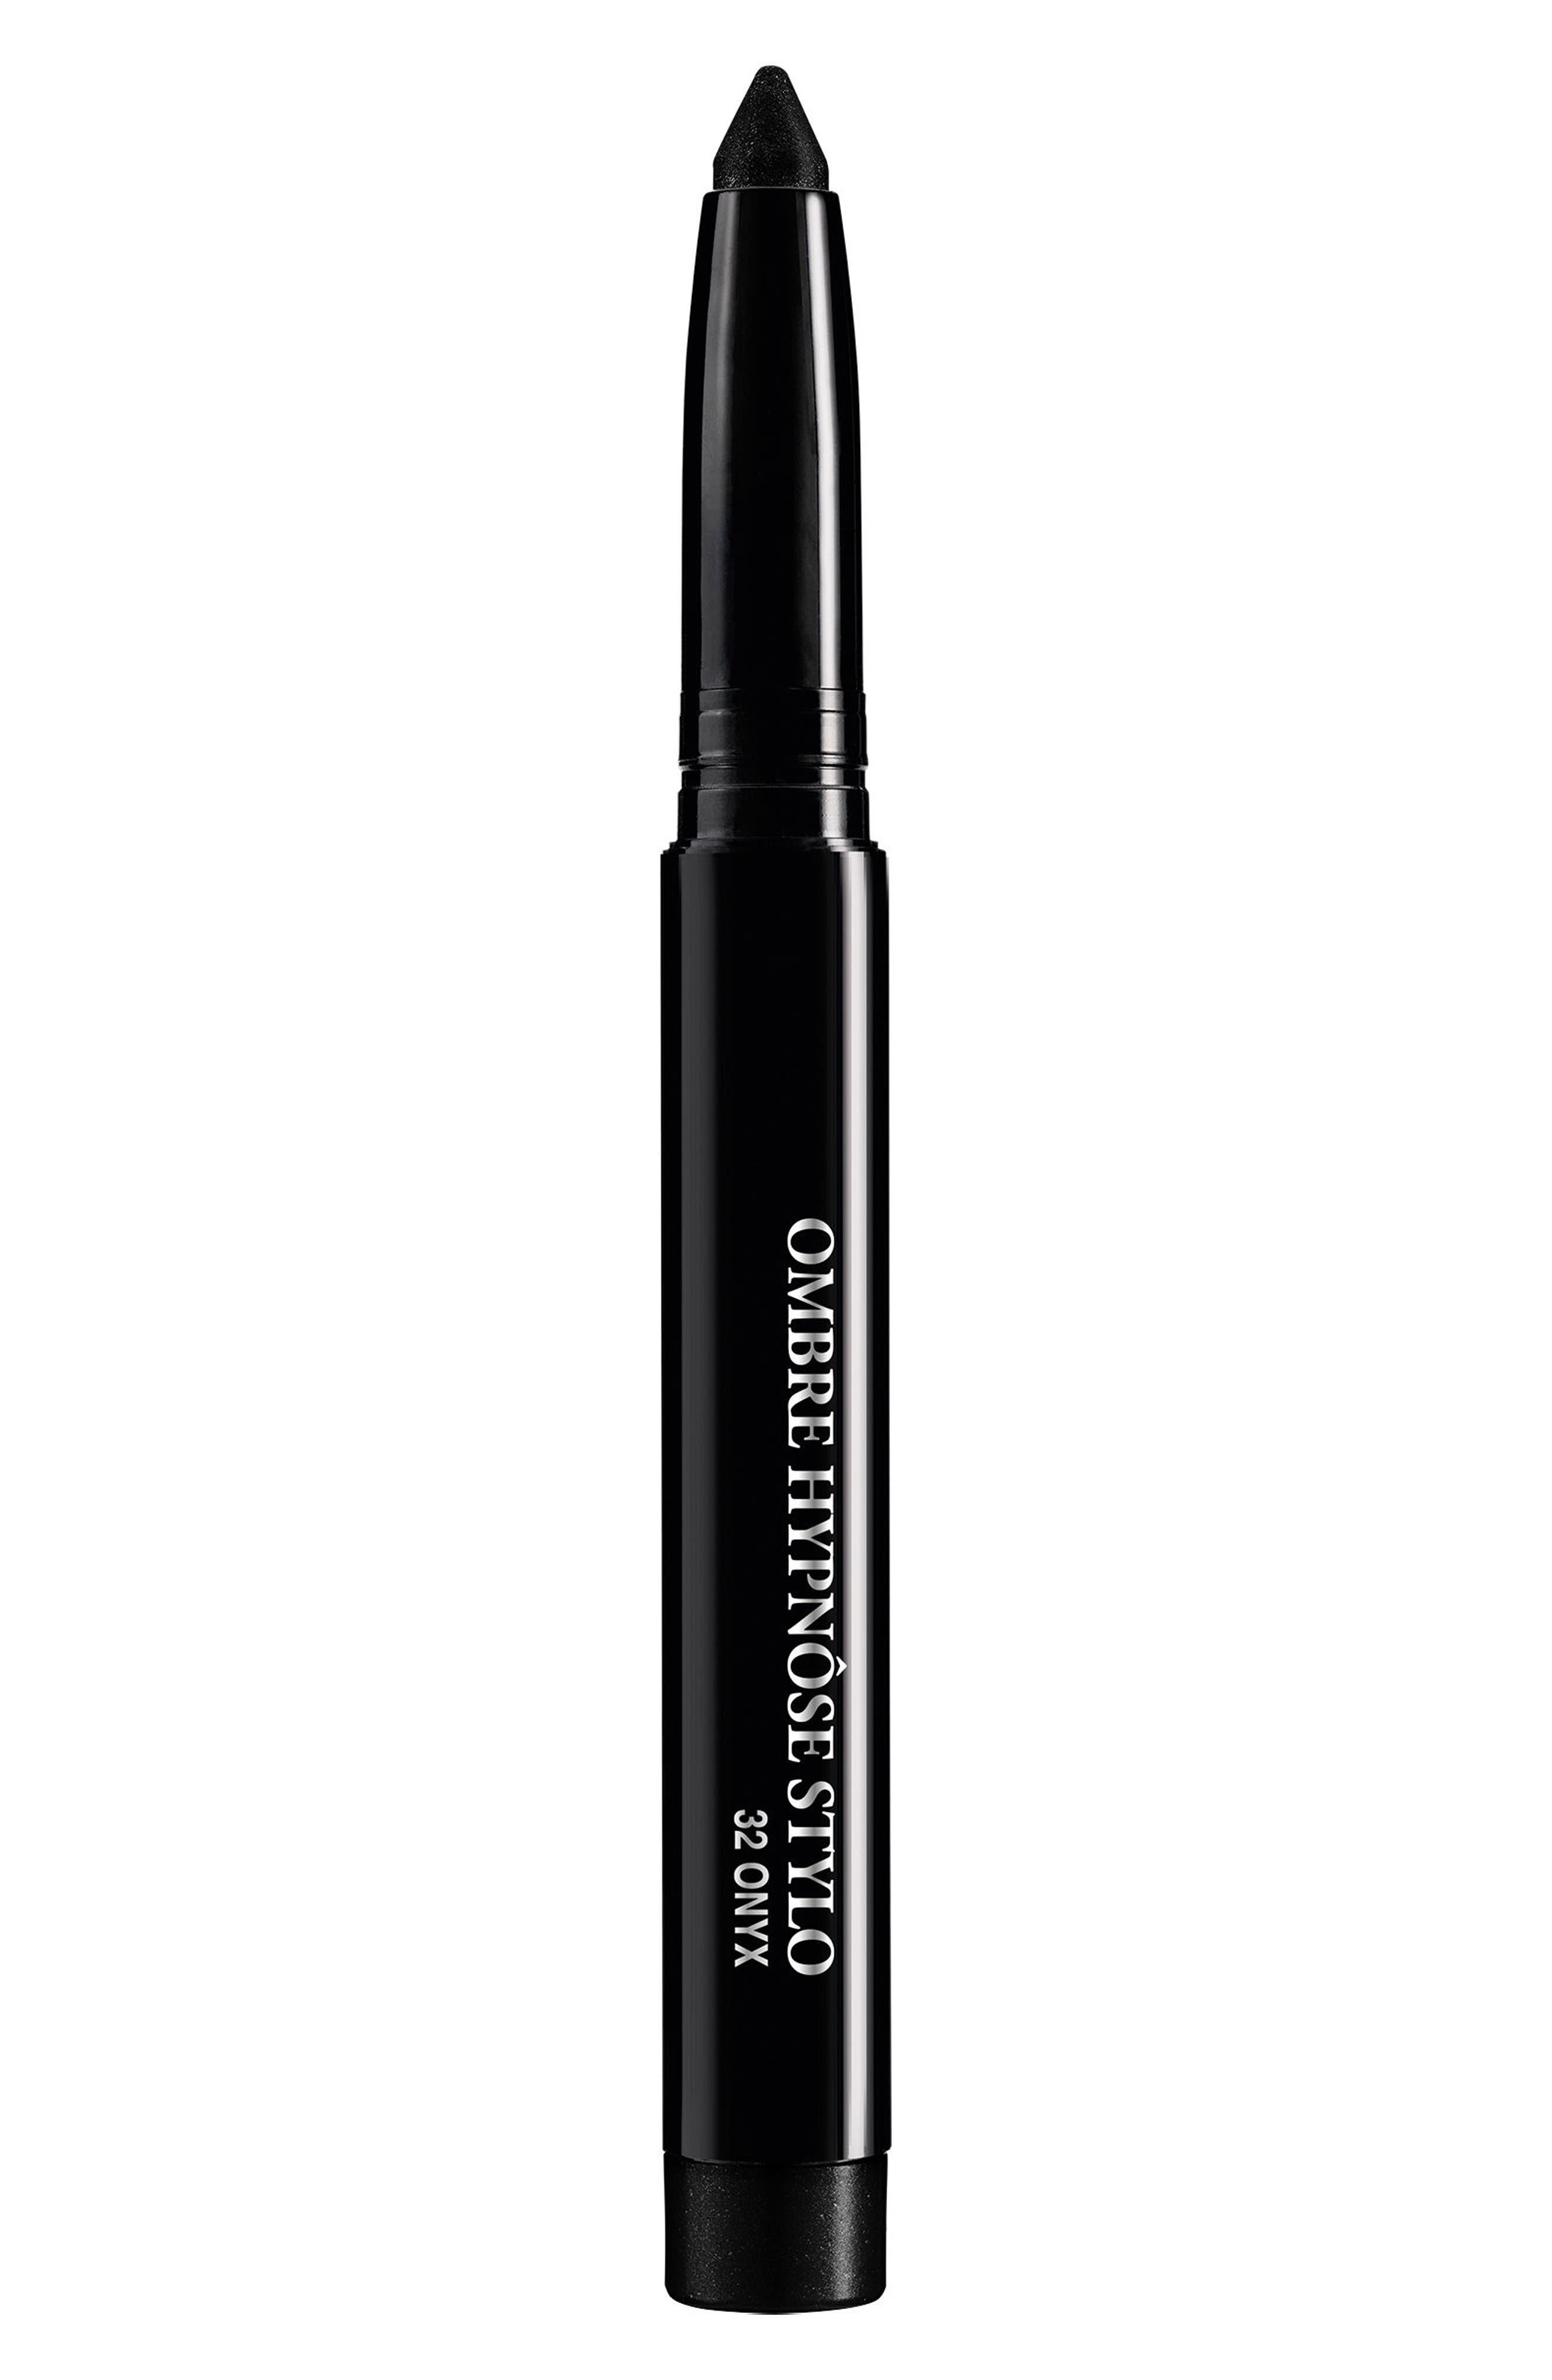 Ombre Hypnôse Stylo Eyeshadow,                         Main,                         color, ONYX